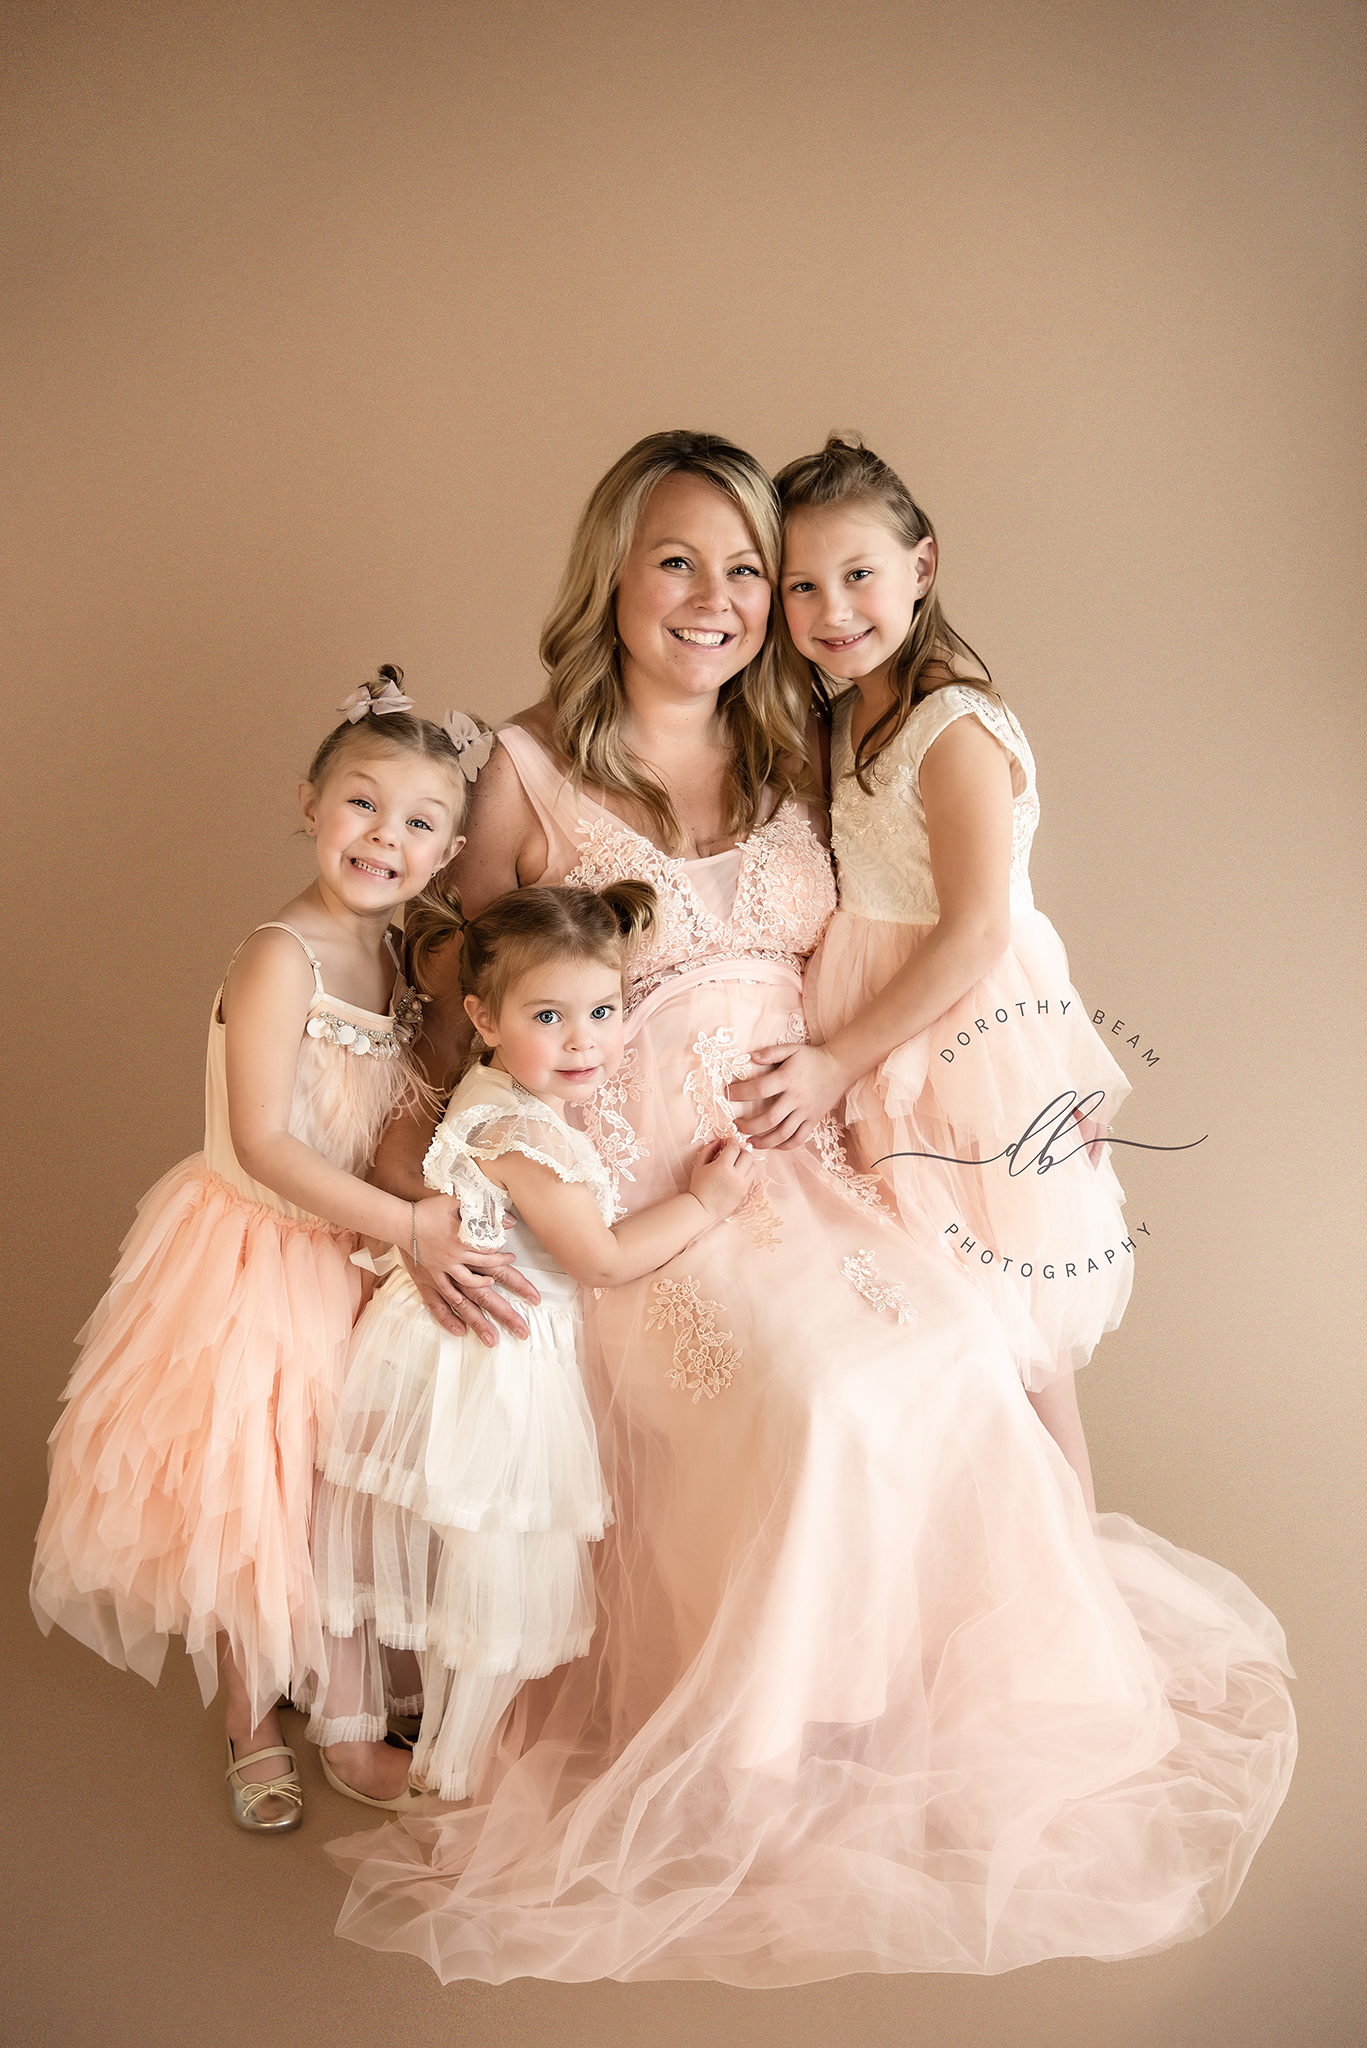 Maternity Pink Gown Studio Dayton Ohio P